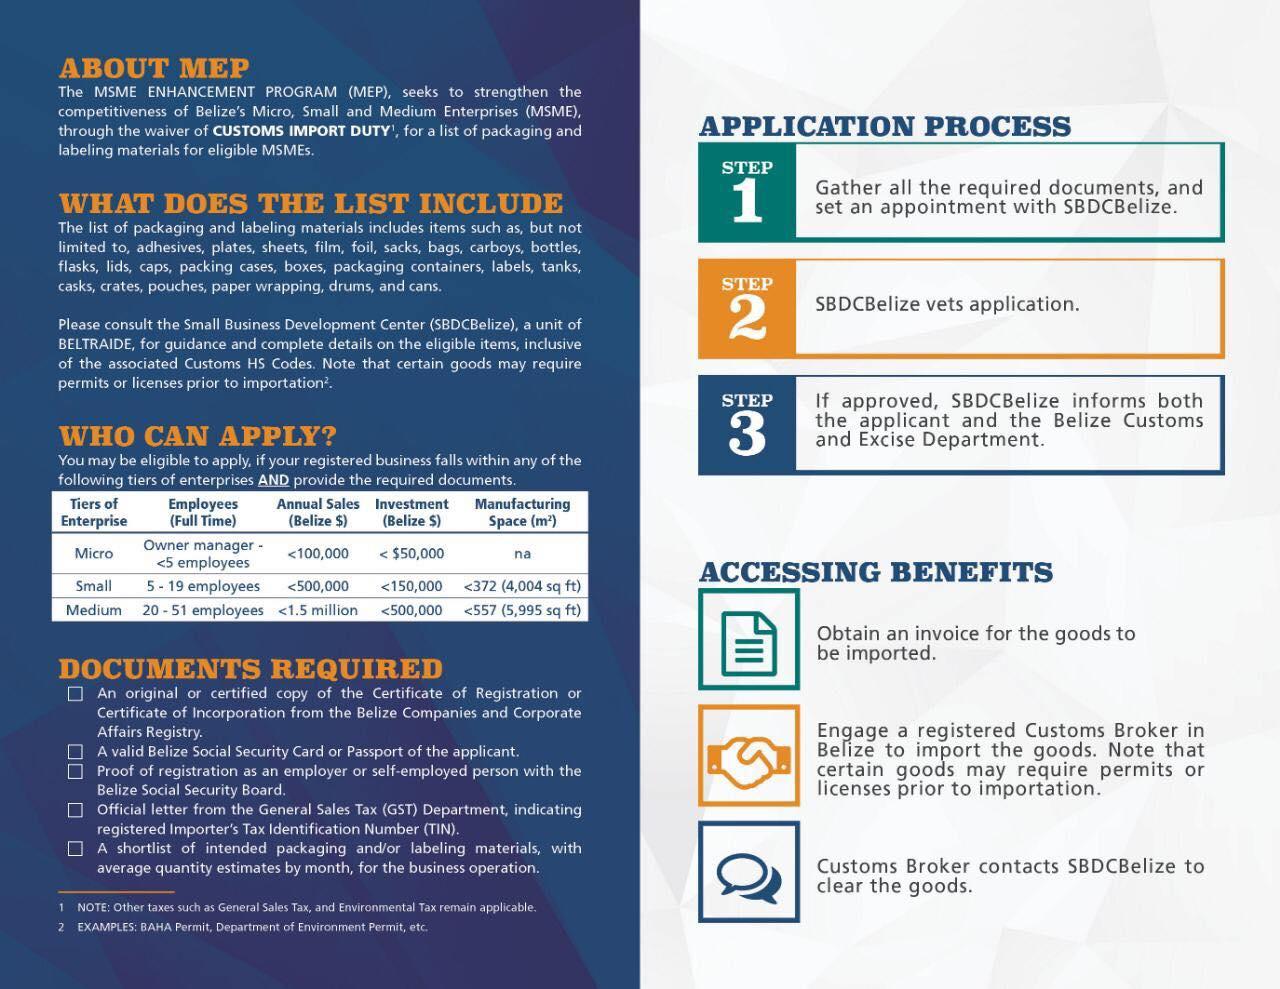 MSME's Enhancement Program (MEP) - Policy Tracker